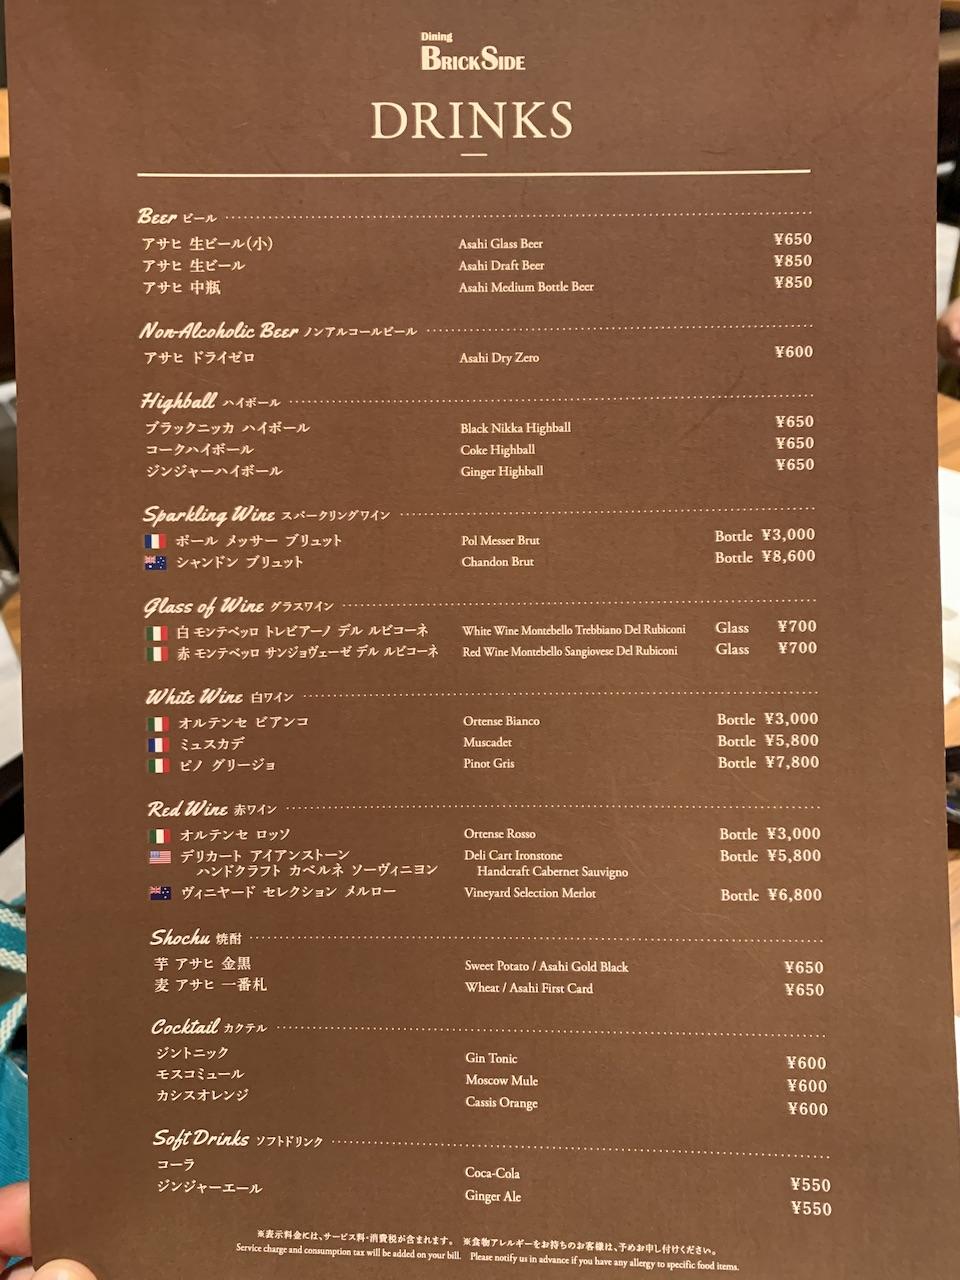 liber-hotel-usj-restaurant-brick-side-26